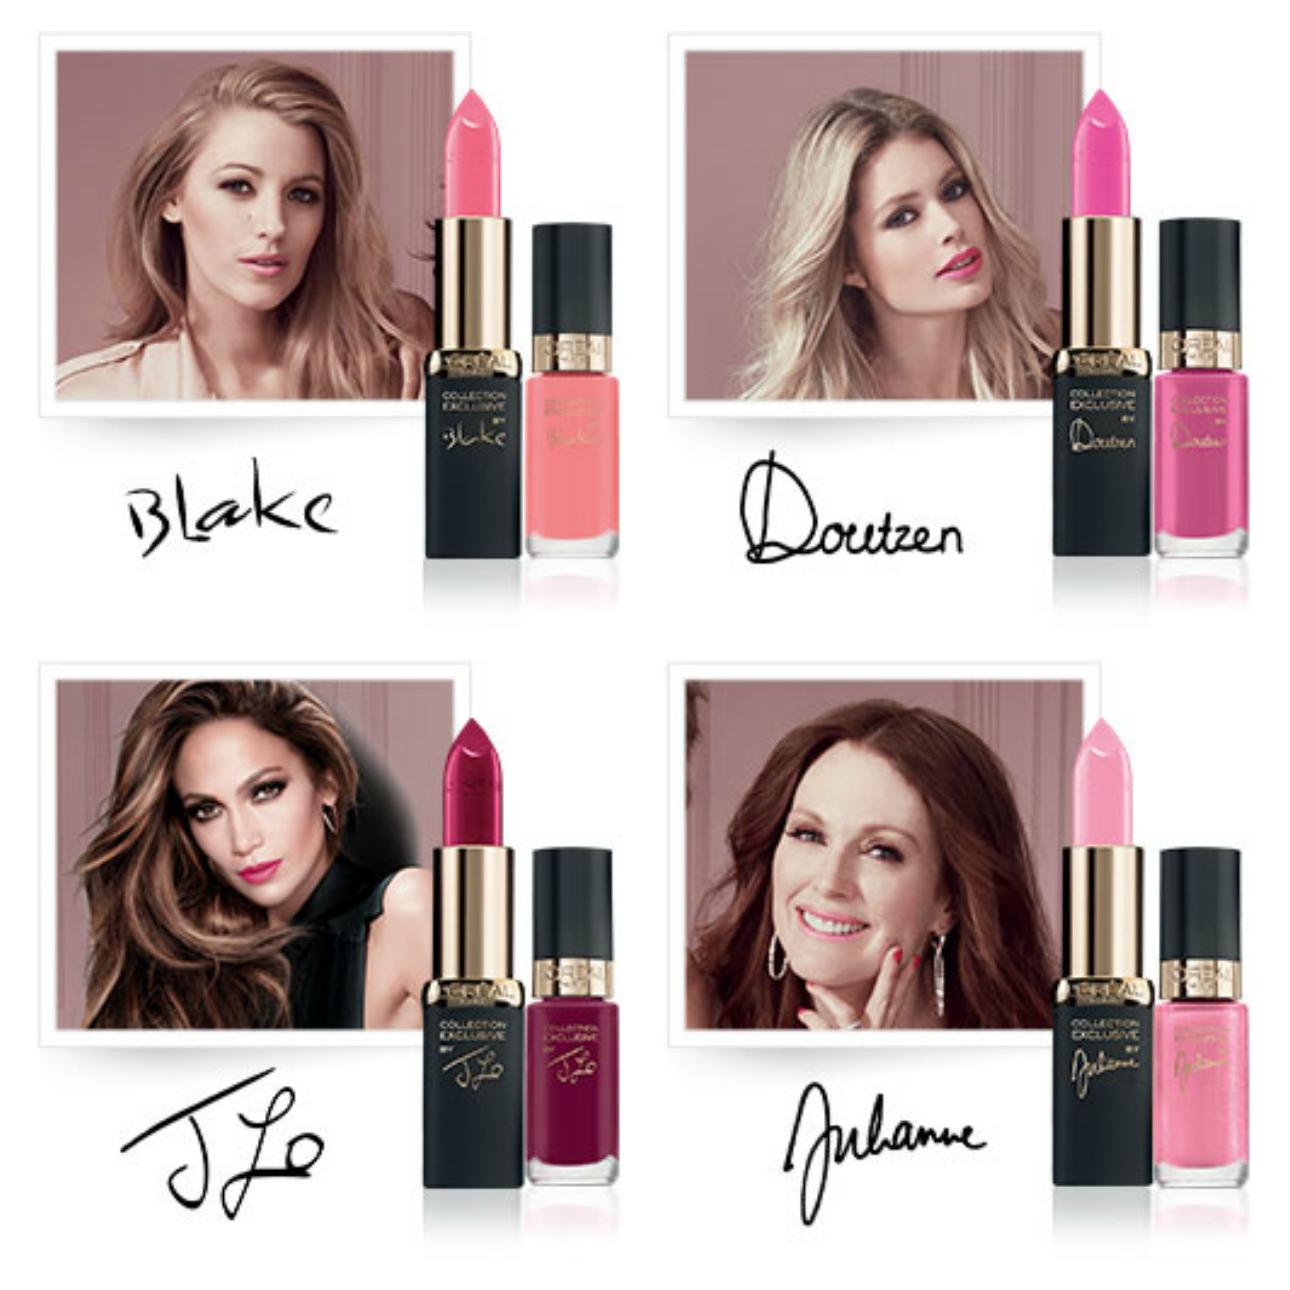 wereldmeisjesdag l'oreal paris la vie en rose lippenstift nagellak free a girl omdatzijhetwaardis